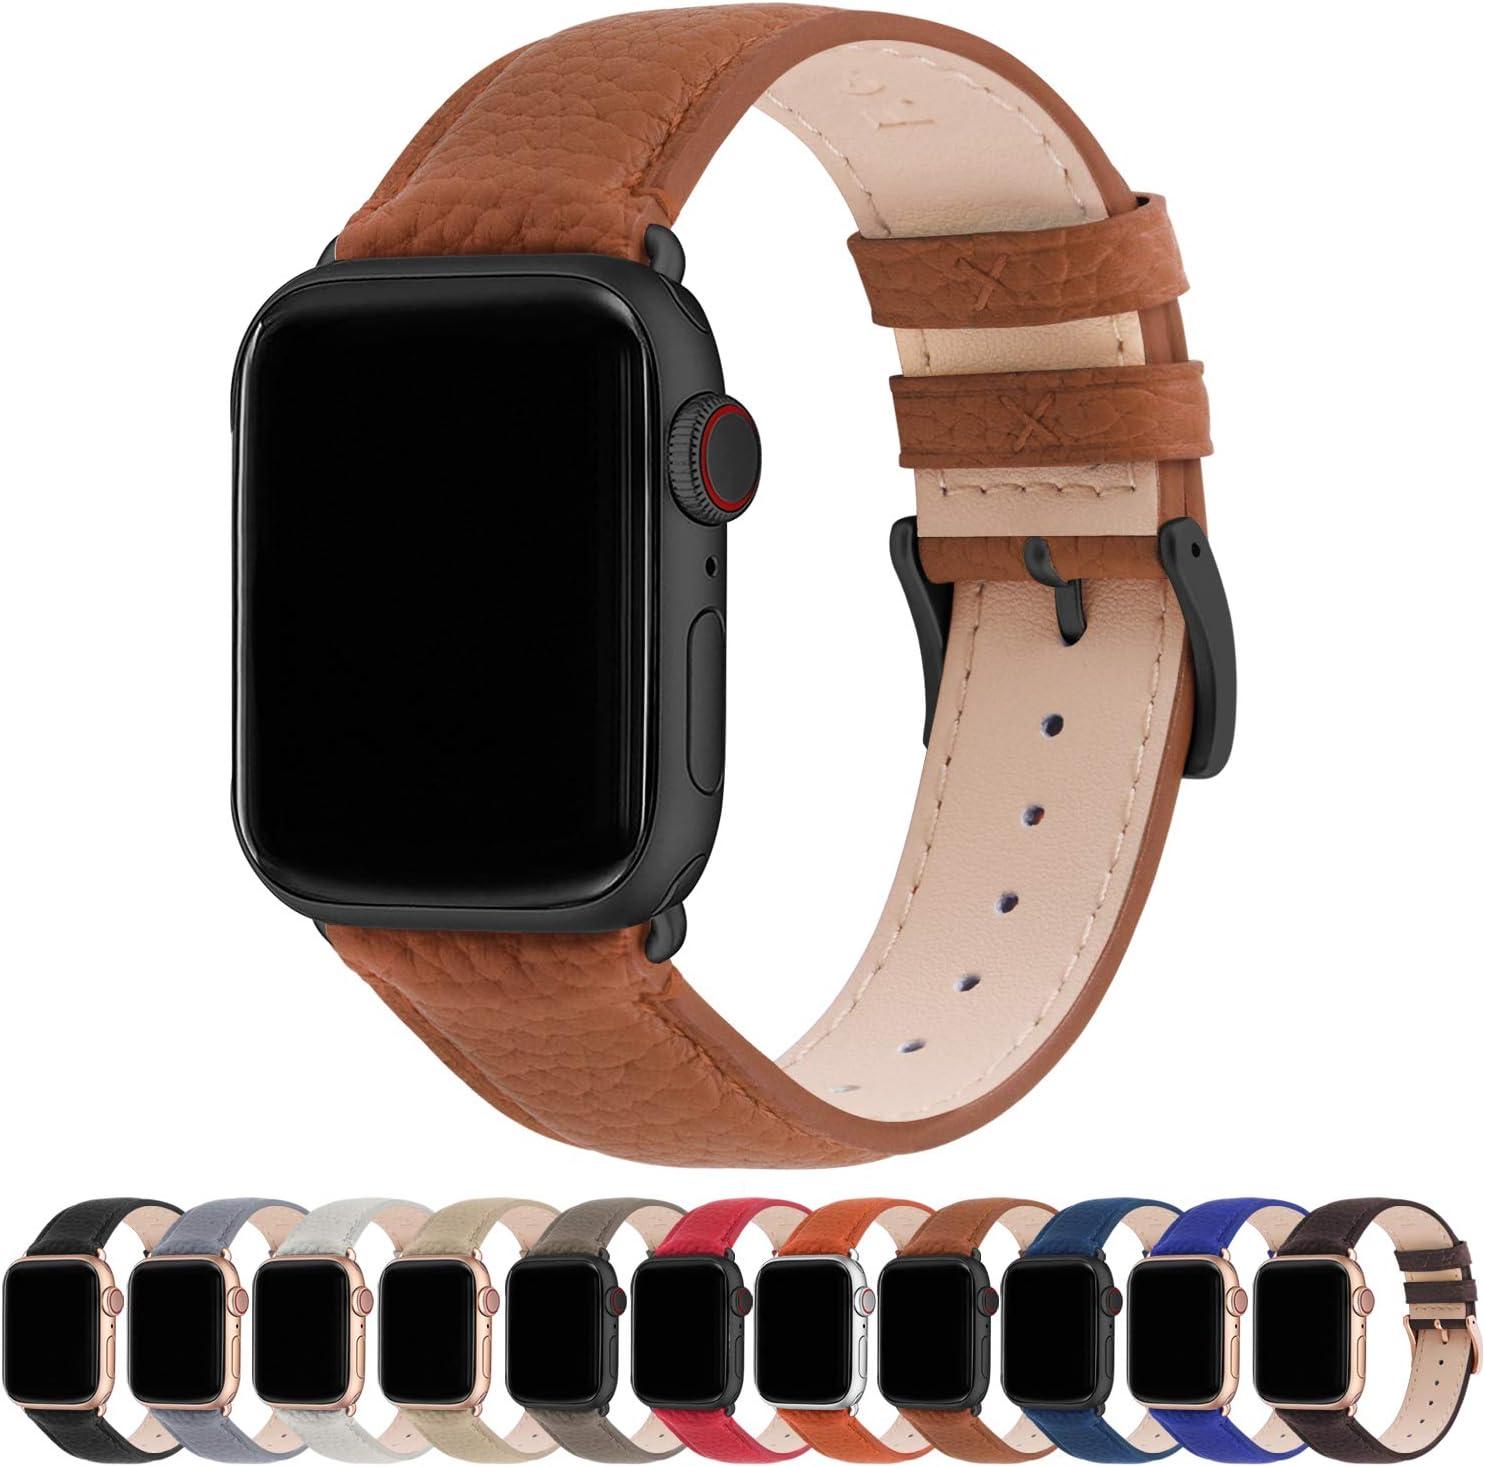 Fullmosa Compatible Apple Watch Band 44mm 42mm 40mm 38mm Leather Compatible iWatch Band/Strap Compatible Apple Watch SE & Series 6 5 4 3 2 1, 42mm 44mm, Brown + Gunmetal Buckle